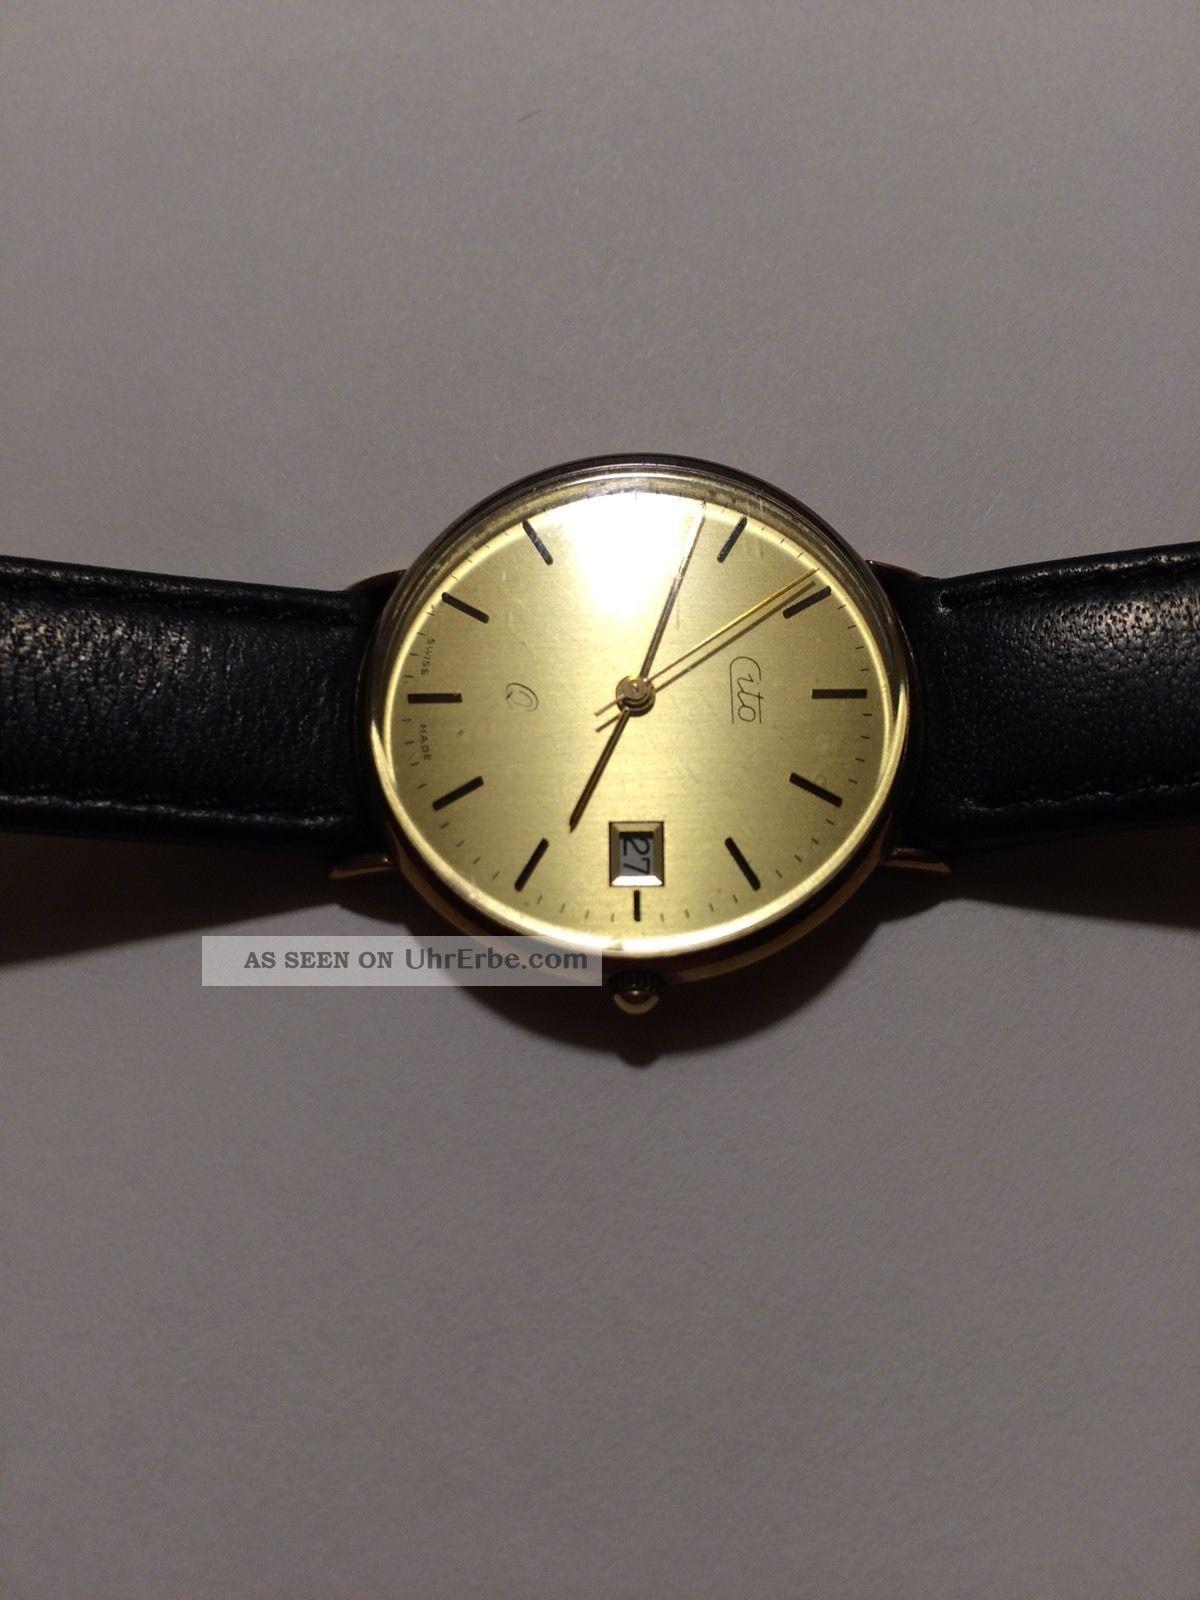 Cito Armbanduhr Herrenuhr Armbanduhren Bild